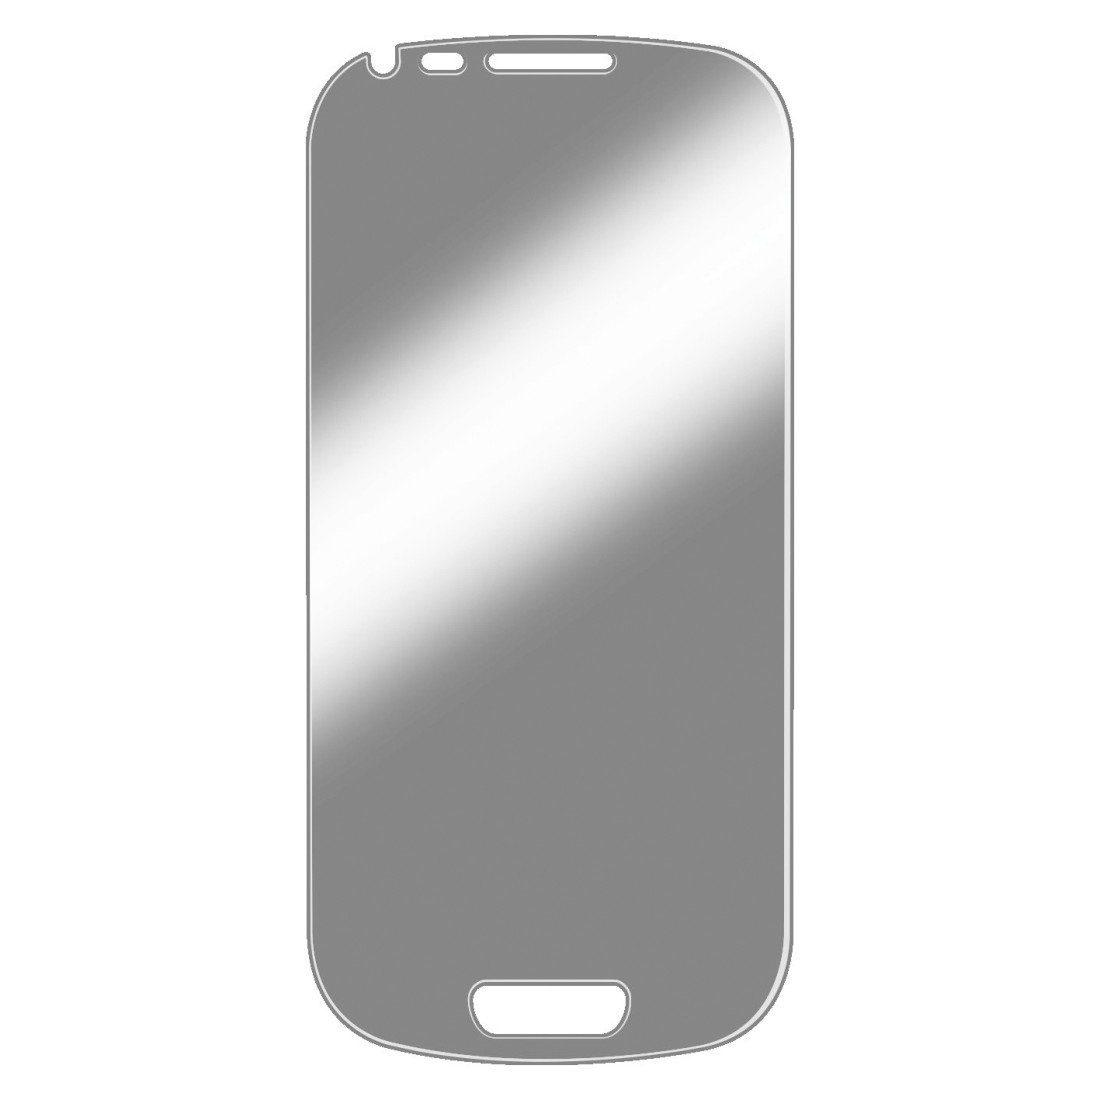 Hama Display-Schutzfolie Crystal Clear für Samsung Galaxy S3 mini, 2